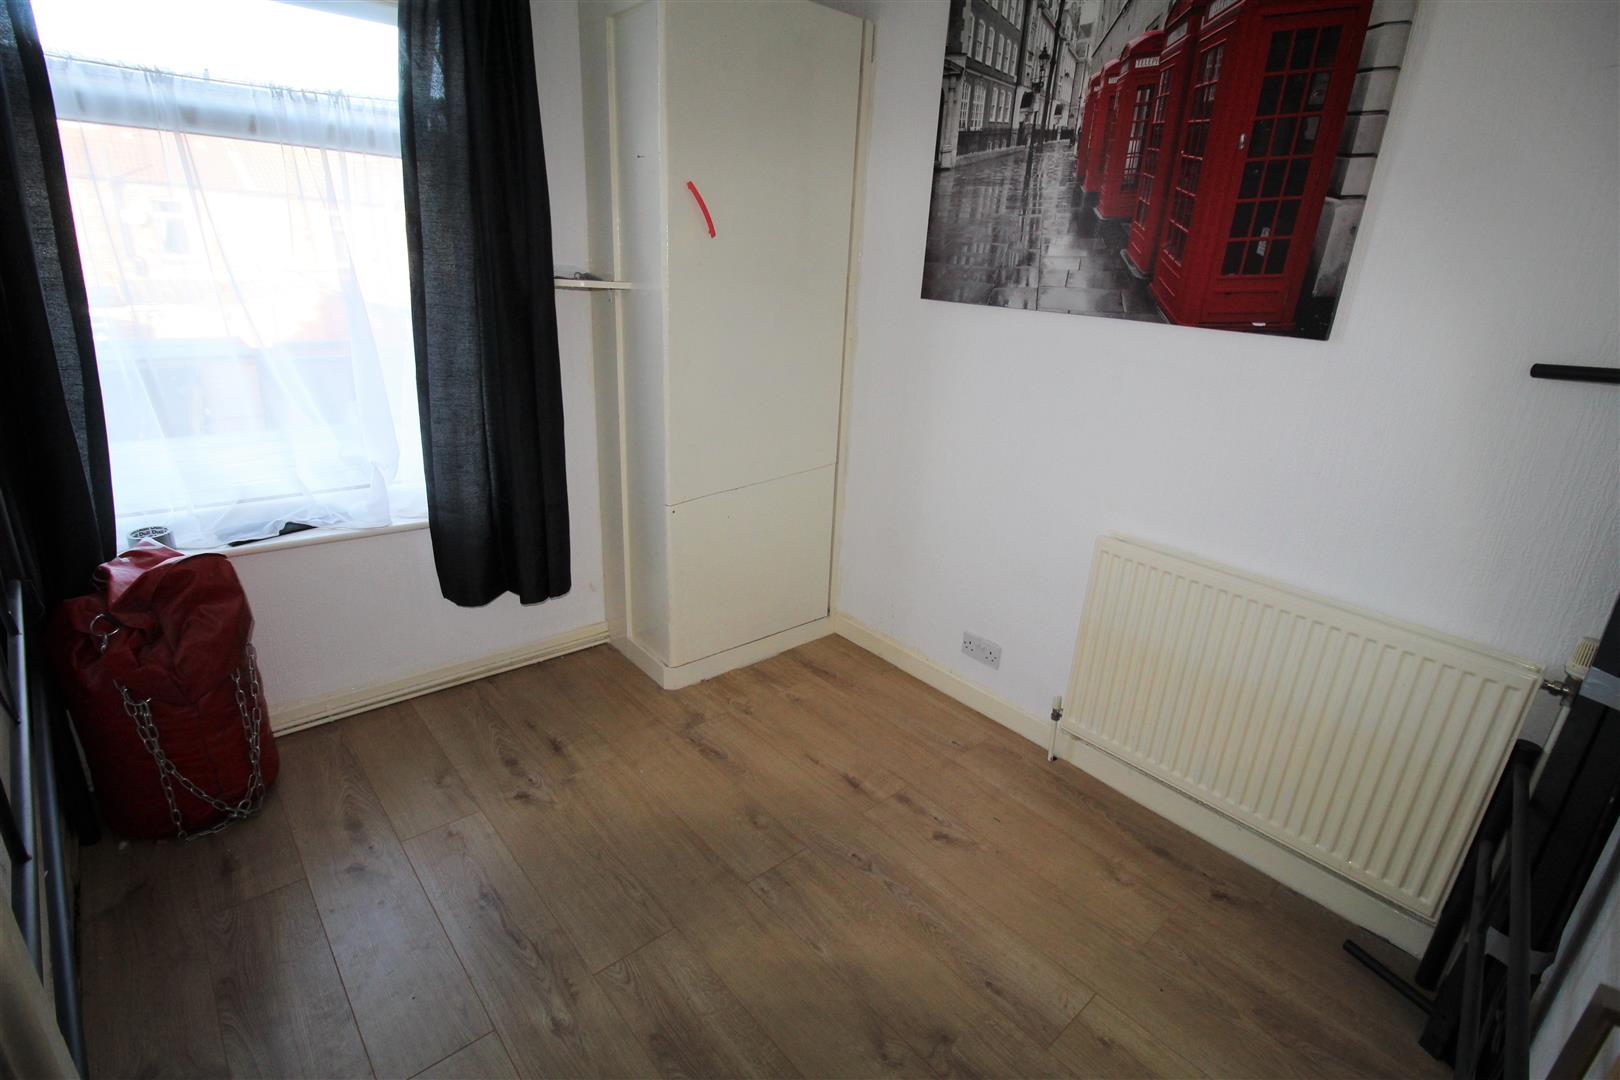 2 Bedrooms, House - Mid Terrace, Albany Road, Walton, Liverpool